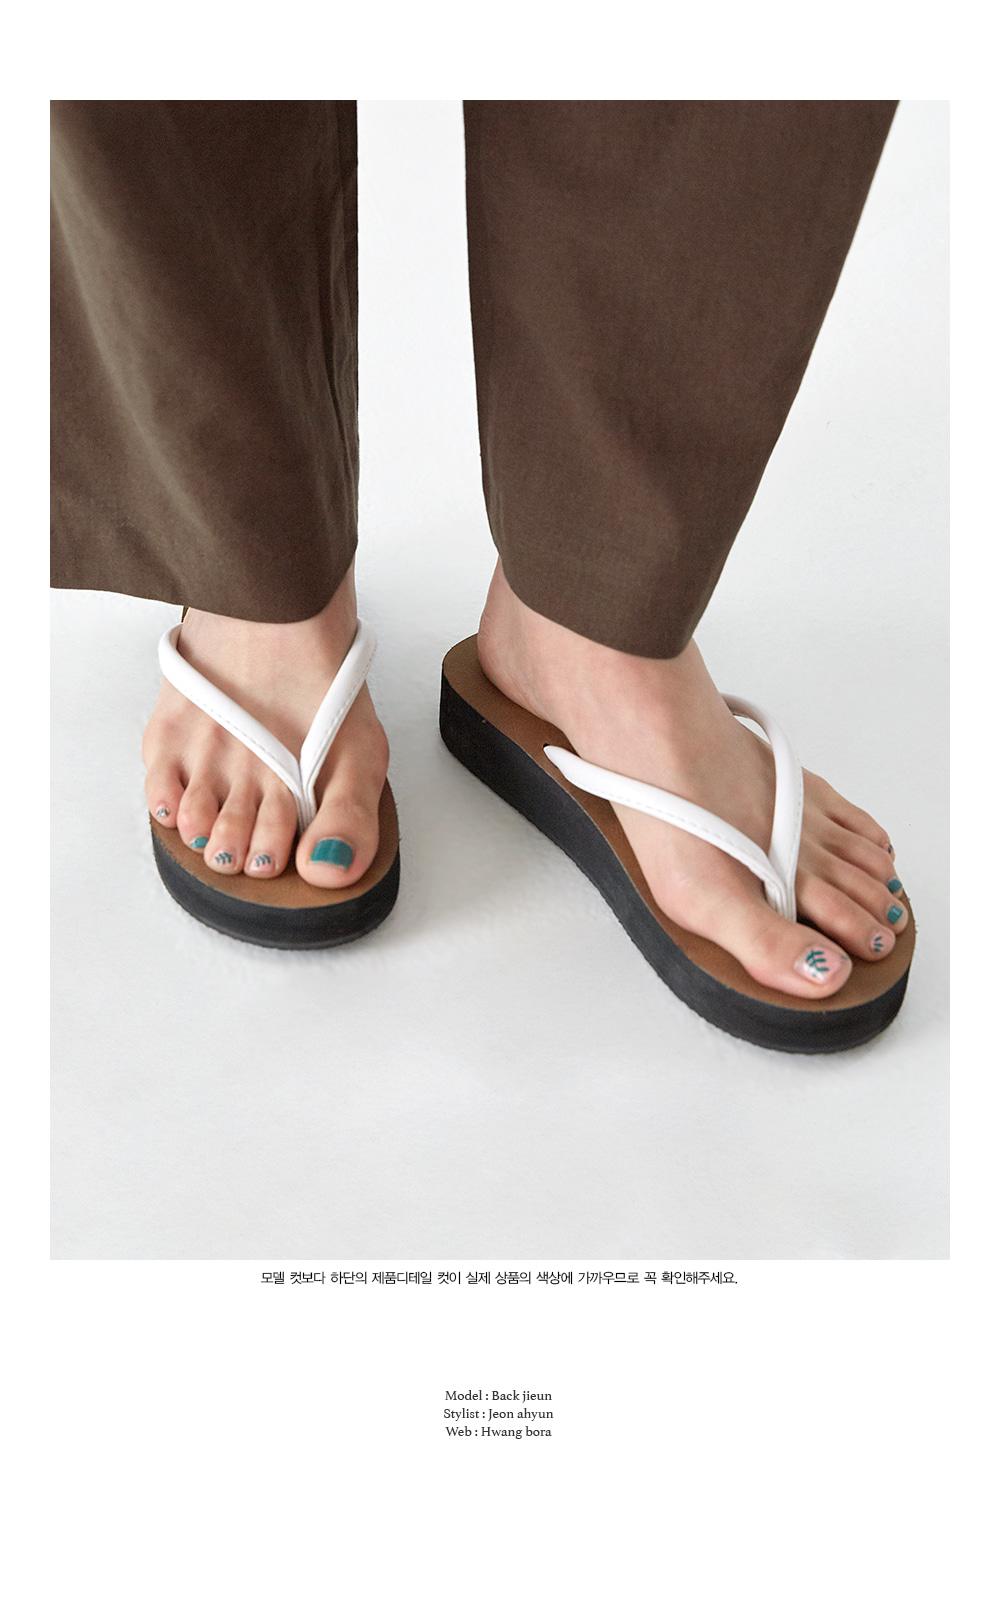 daily platform flip flop (230-250)